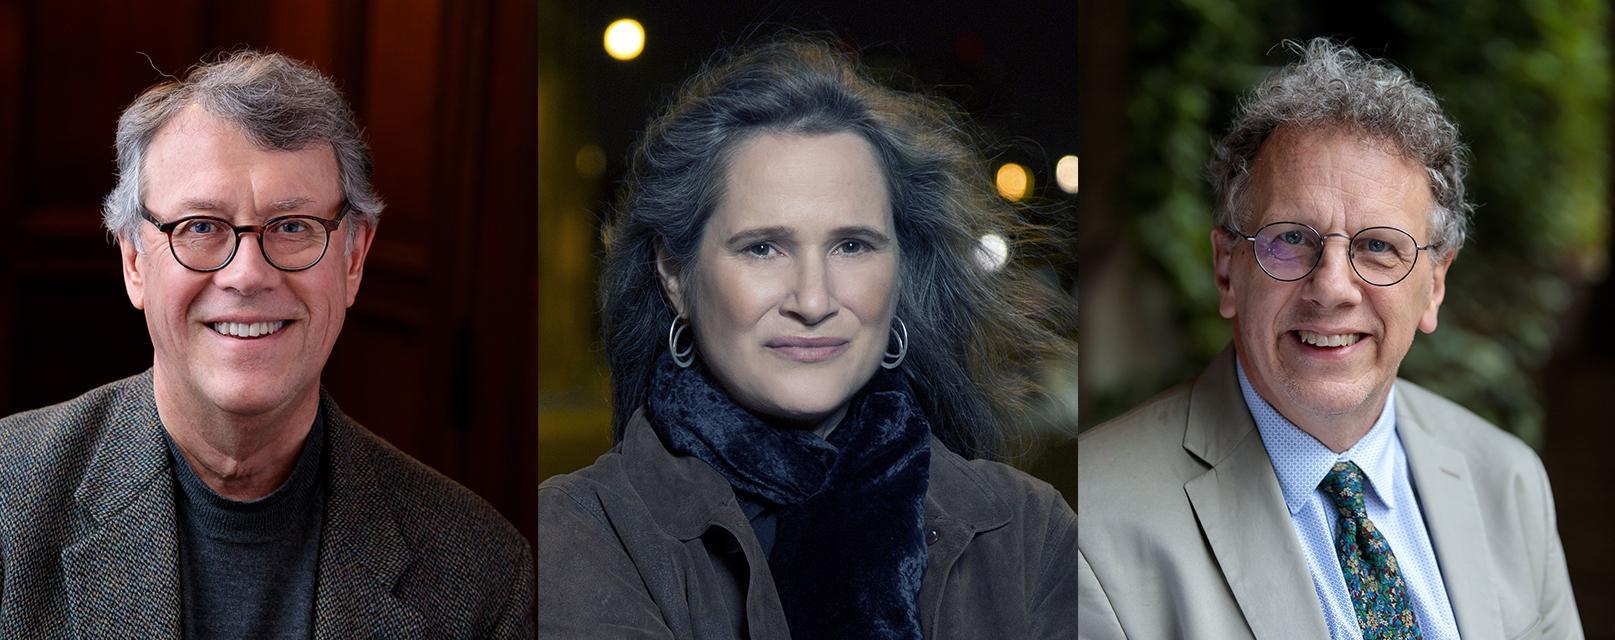 From left to right, Philip Bohlman, Martha Feldman, and Robert Kendrick headshots